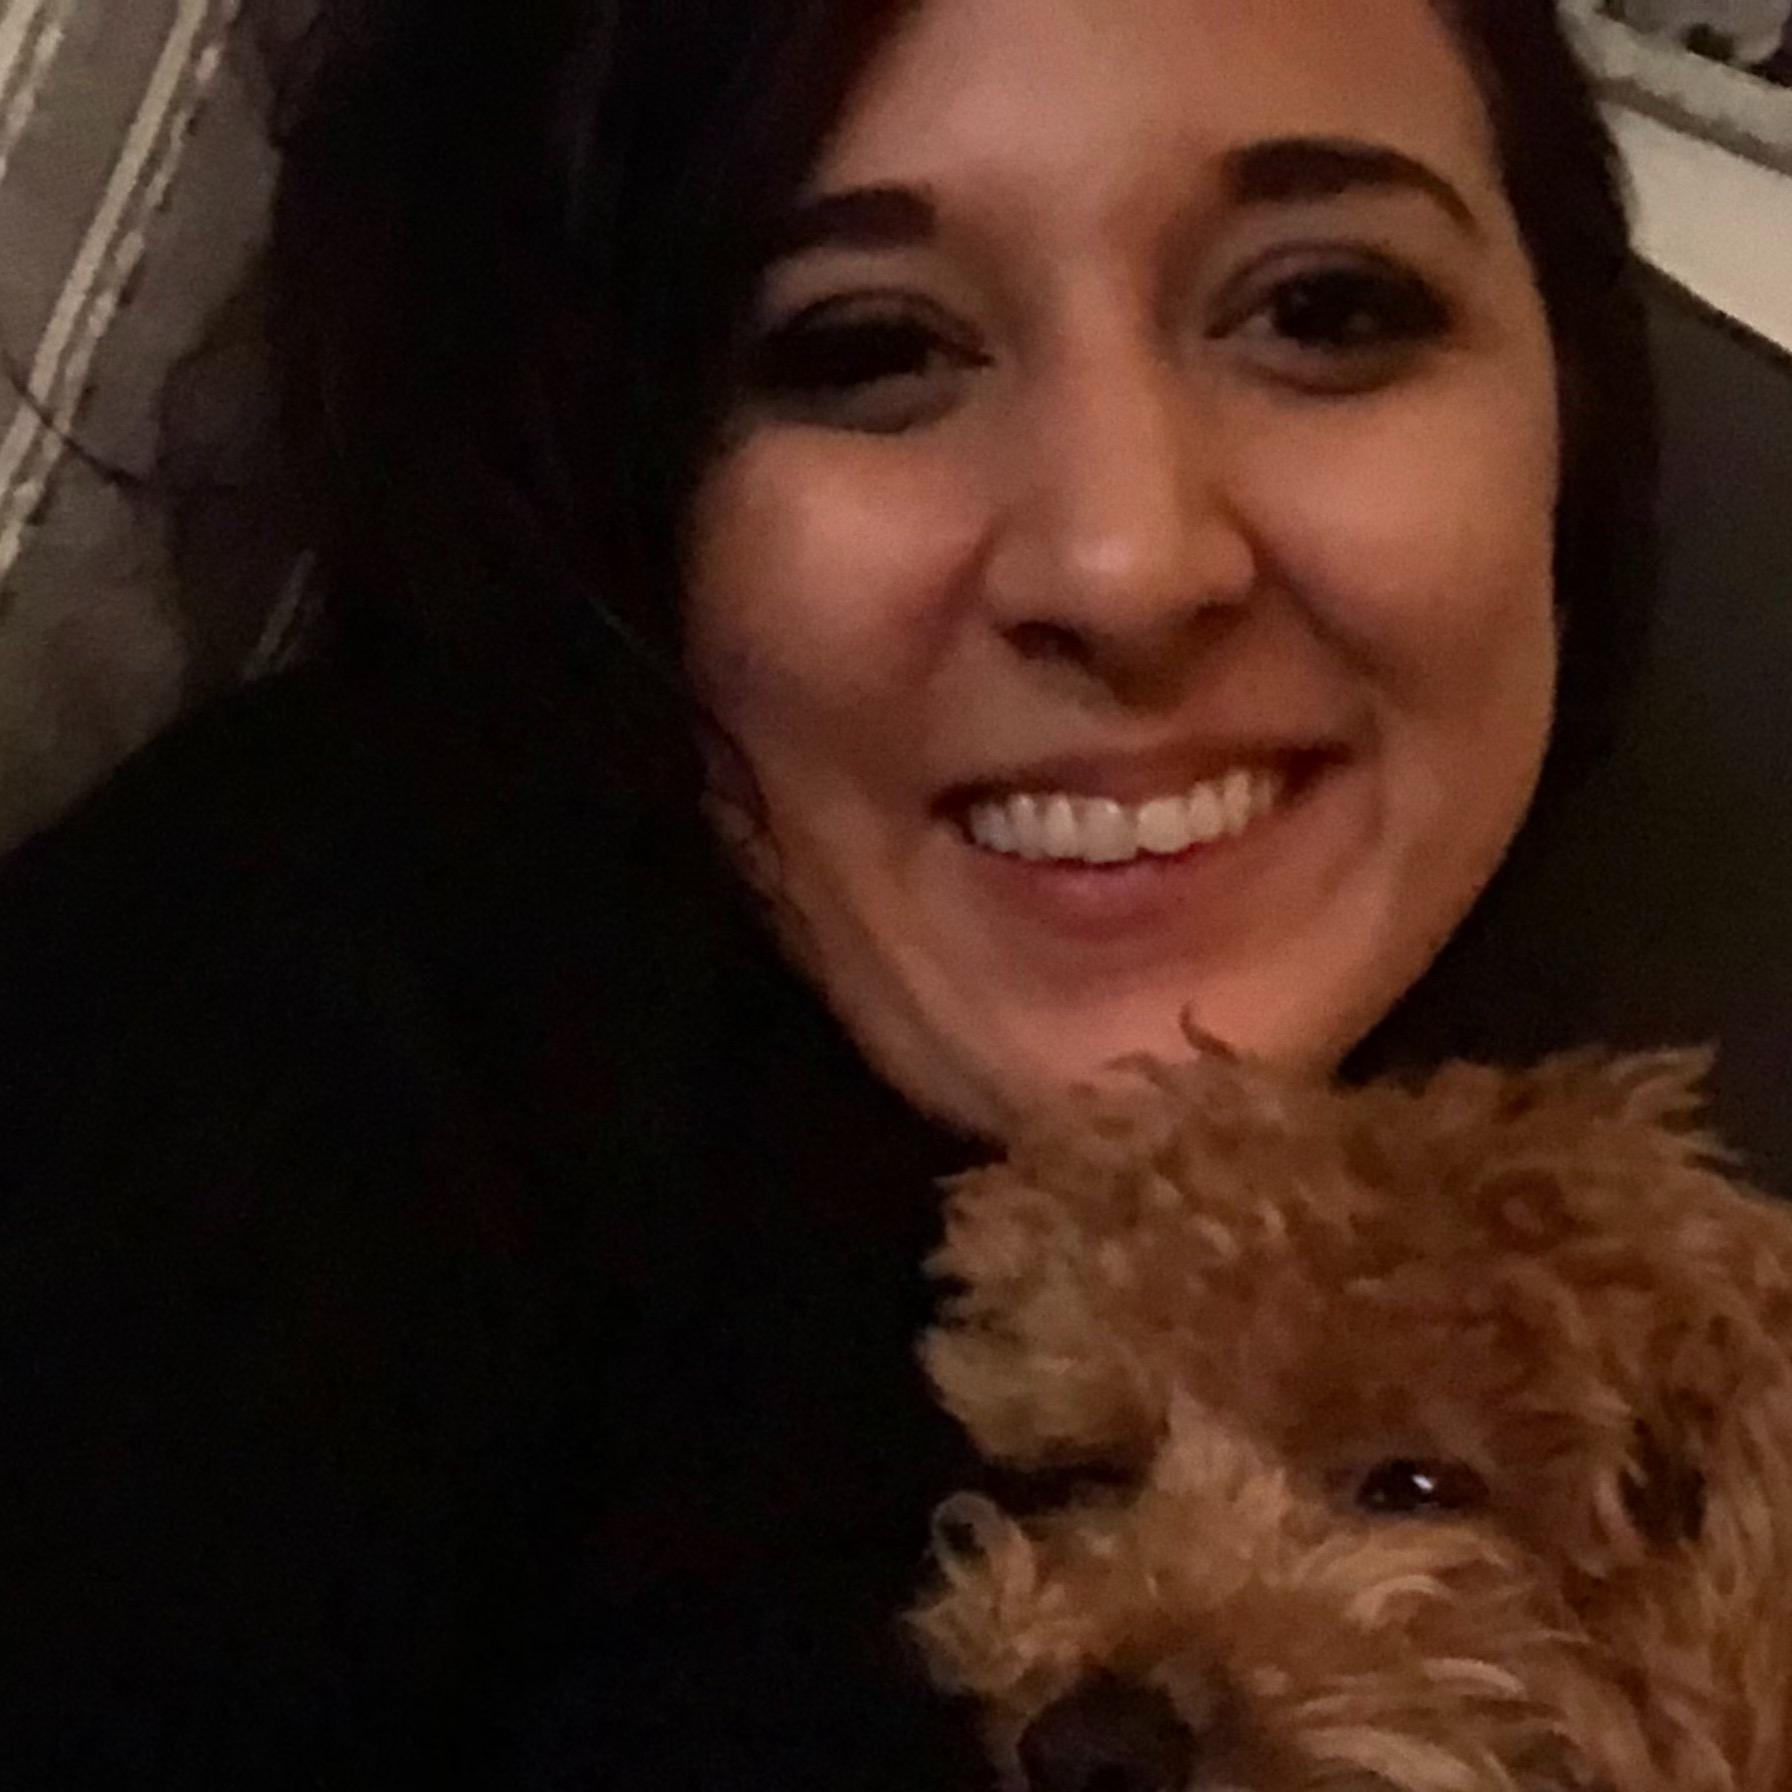 Danielle's dog day care